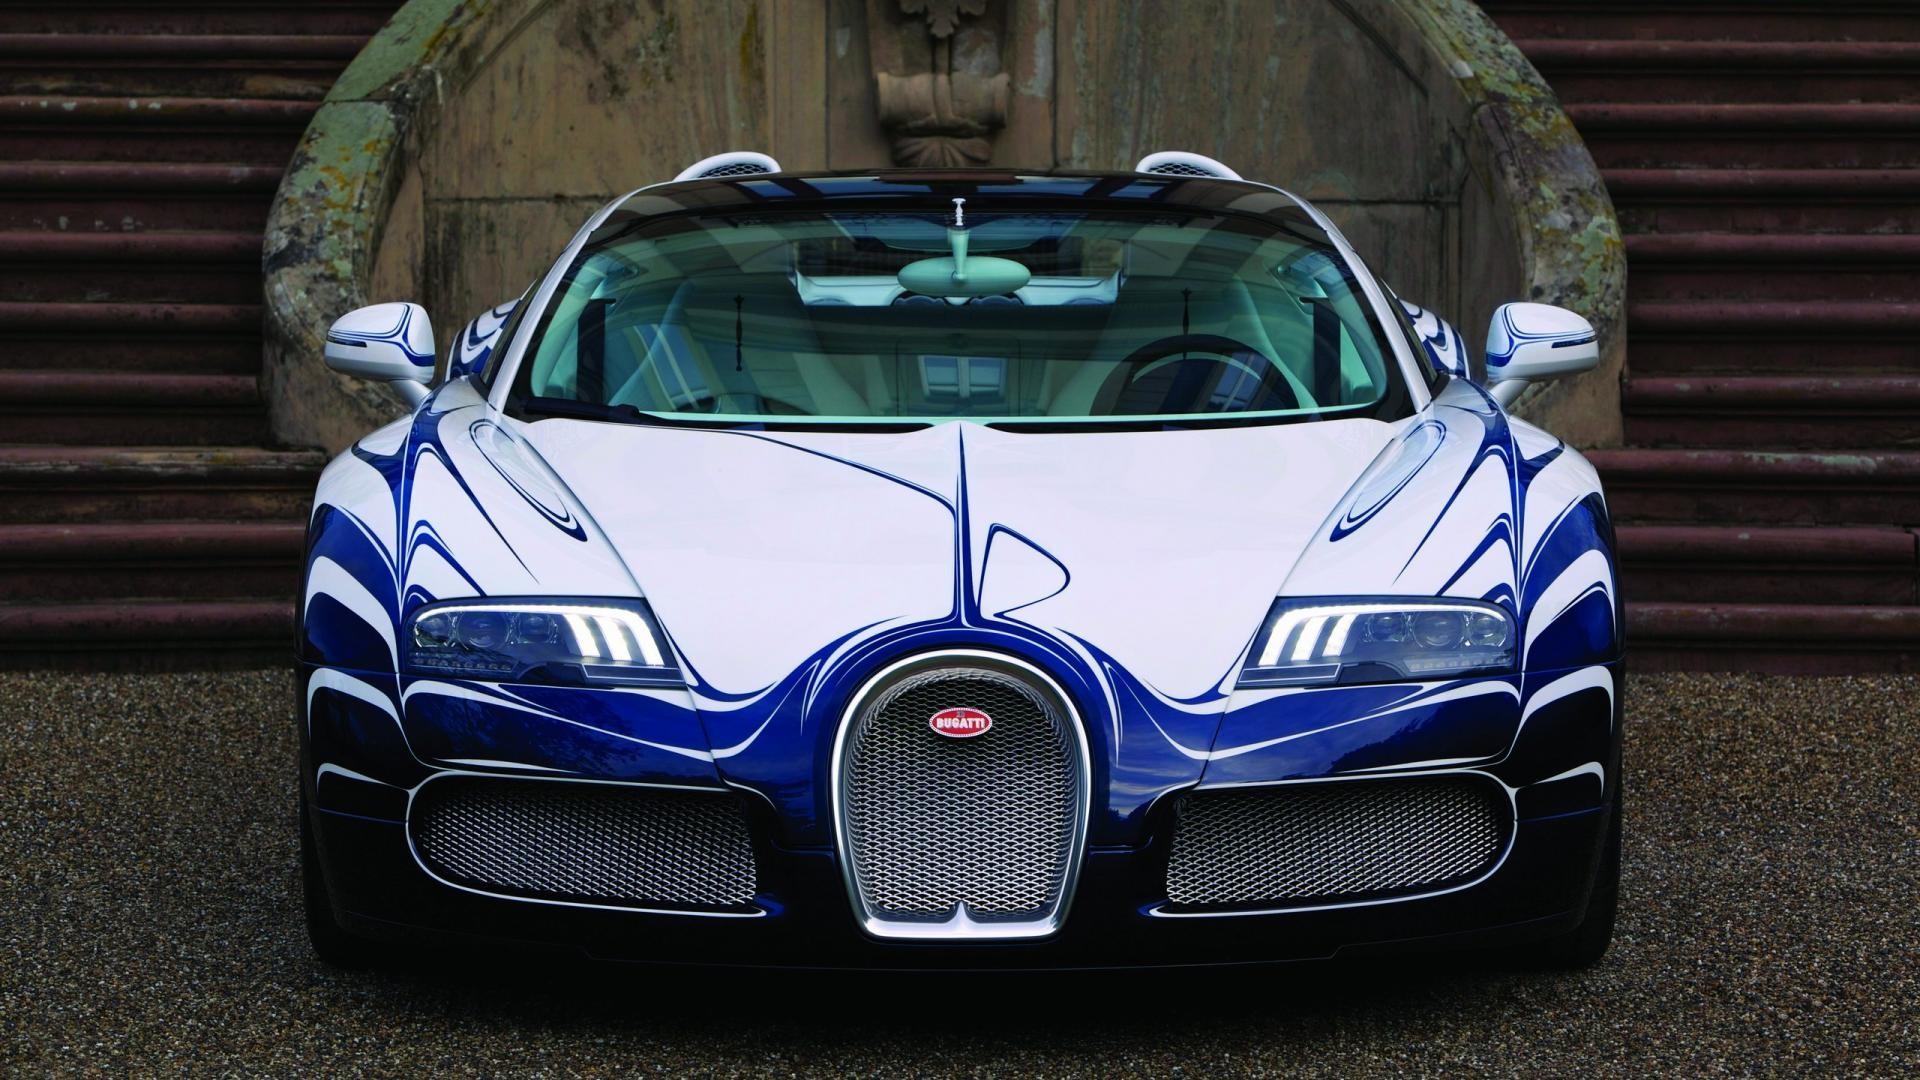 White And Blue Bugatti Veyron Grand Sport 2015 Hd Car - Bugatti Car Photos Download - HD Wallpaper